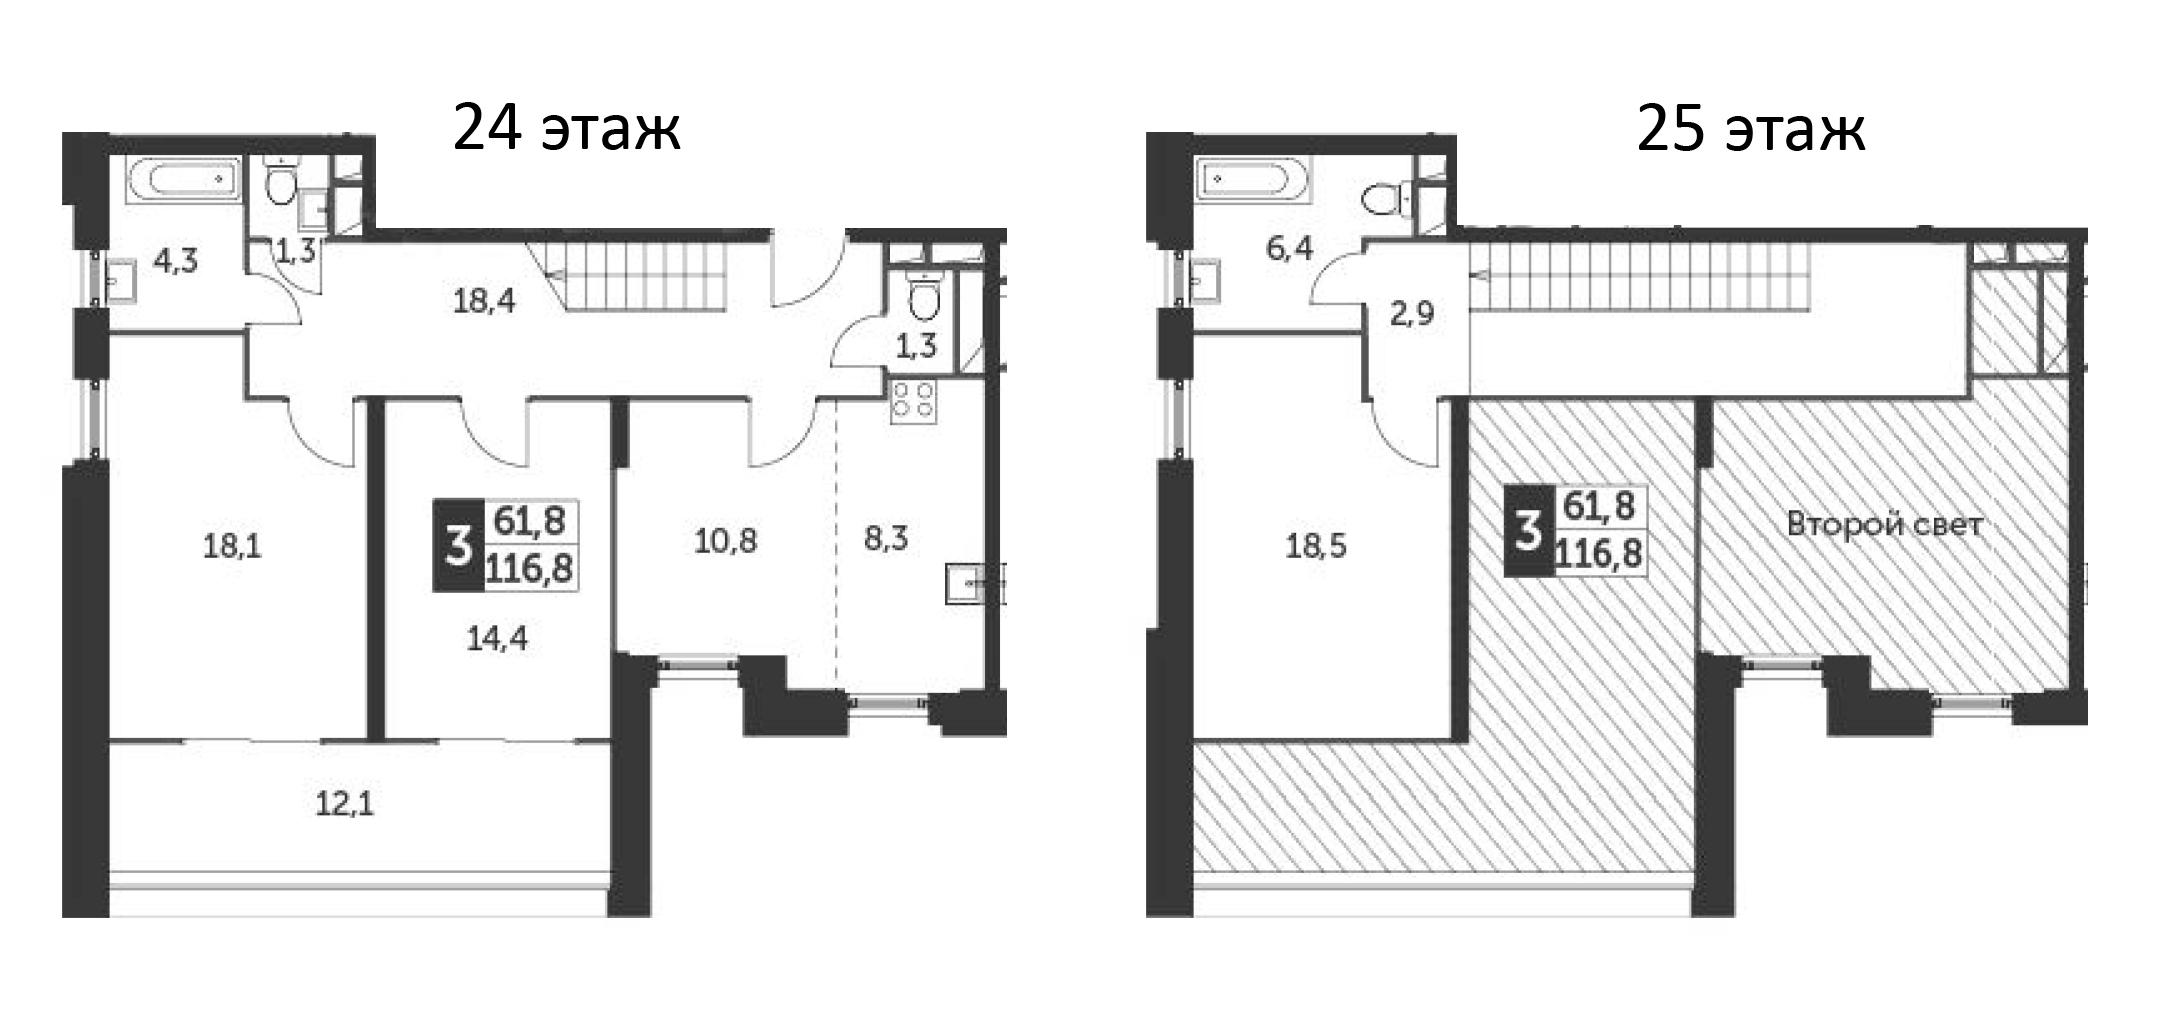 4Е-комнатная квартира, 116.8 м², 24 этаж – Планировка